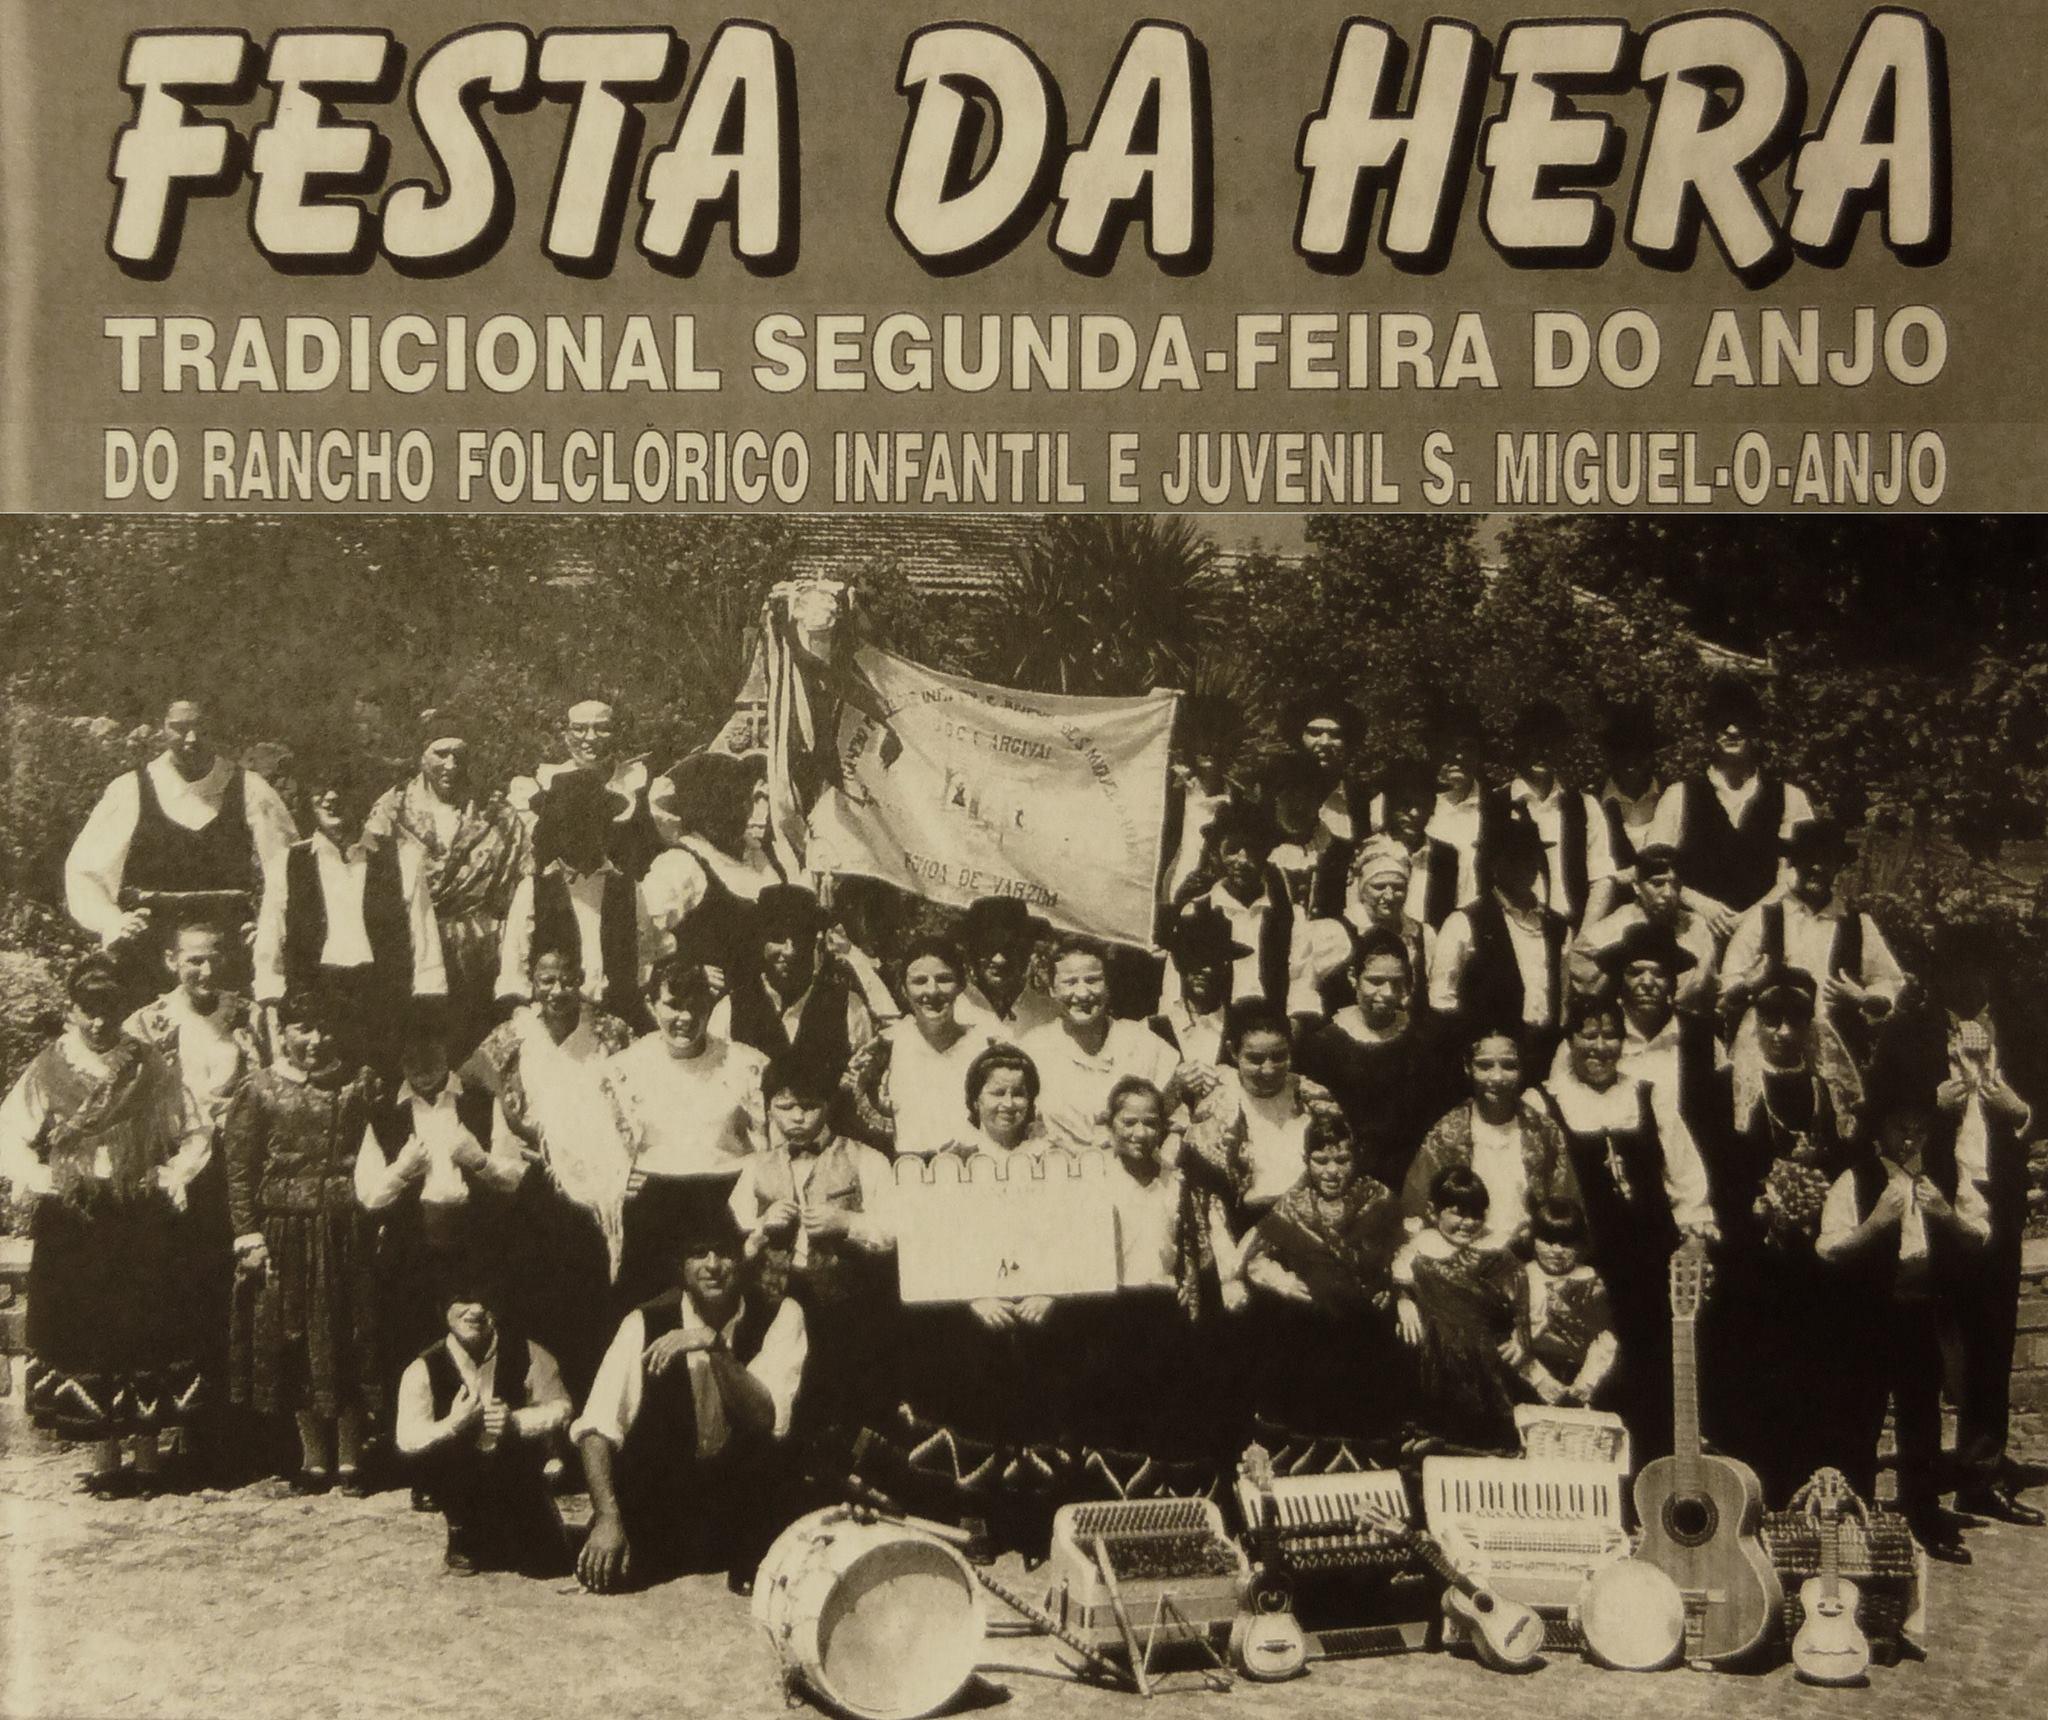 3.2.3 Festa da Hera